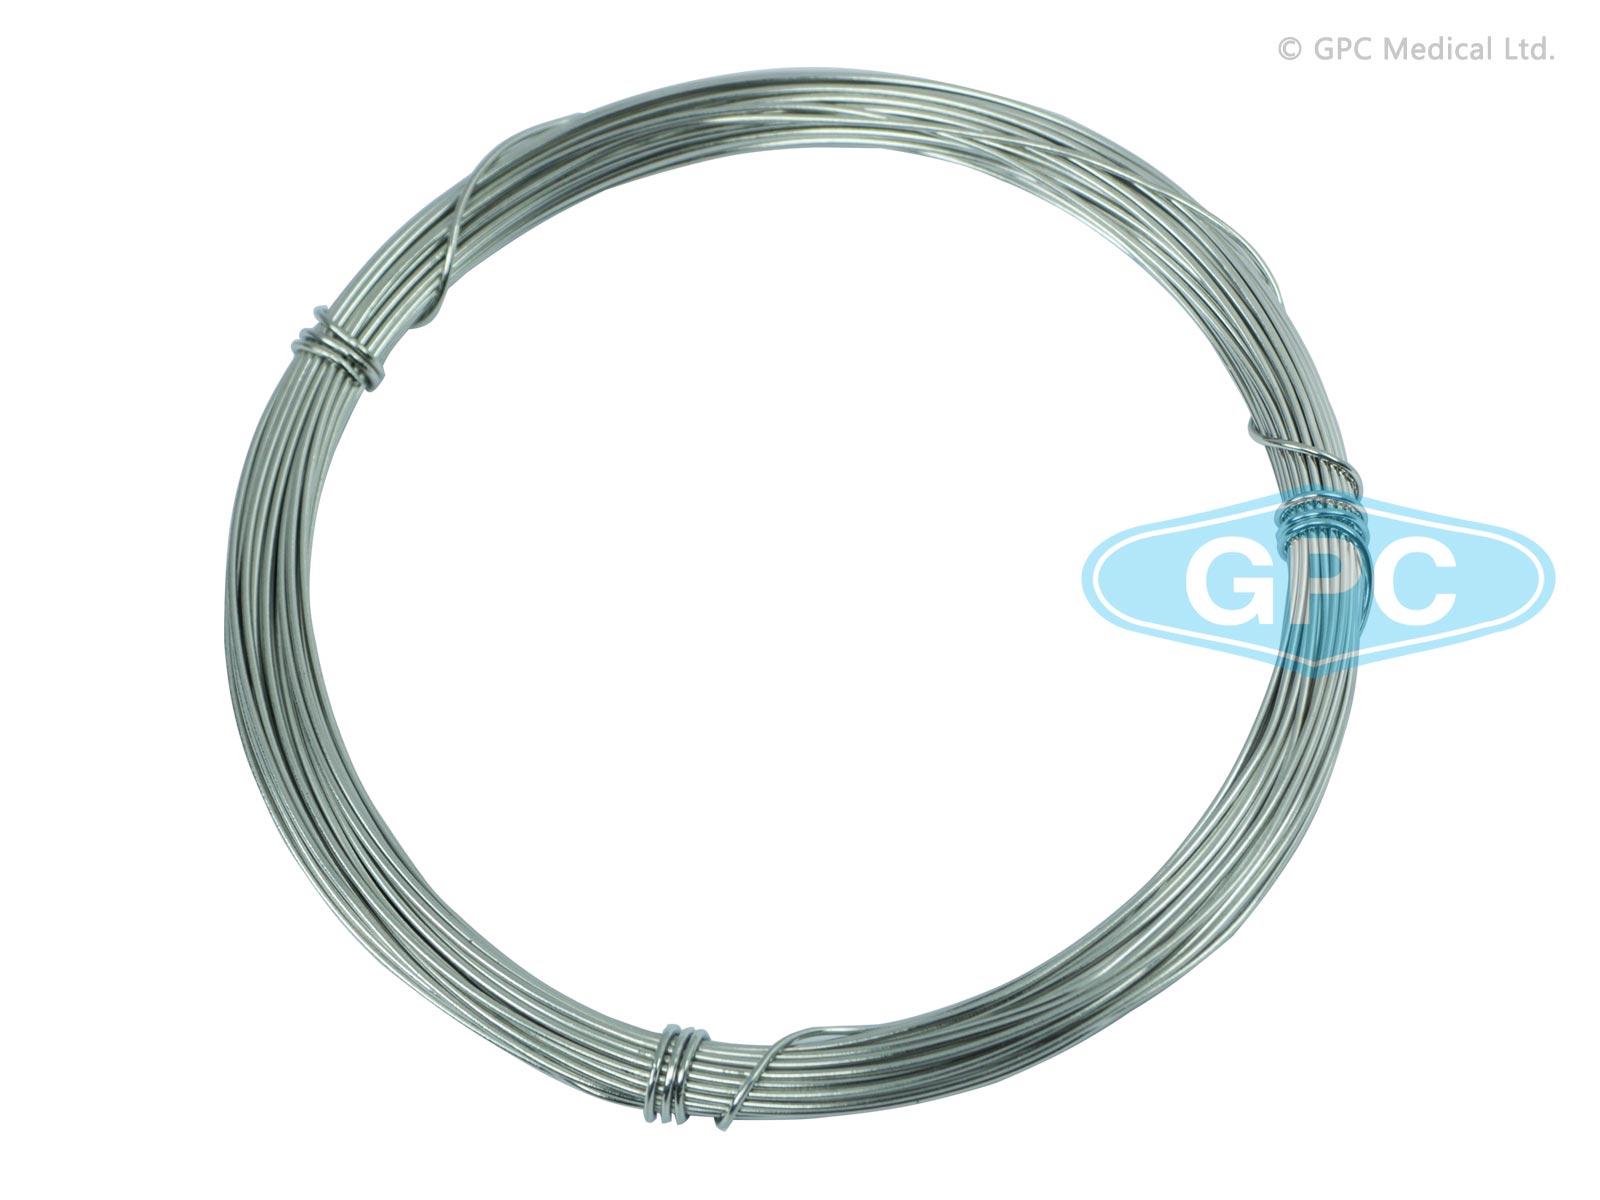 S.S Wire Roll 10m. Gauge- 16 SWG to 36 SWG | S.S Wire Roll 10m ...